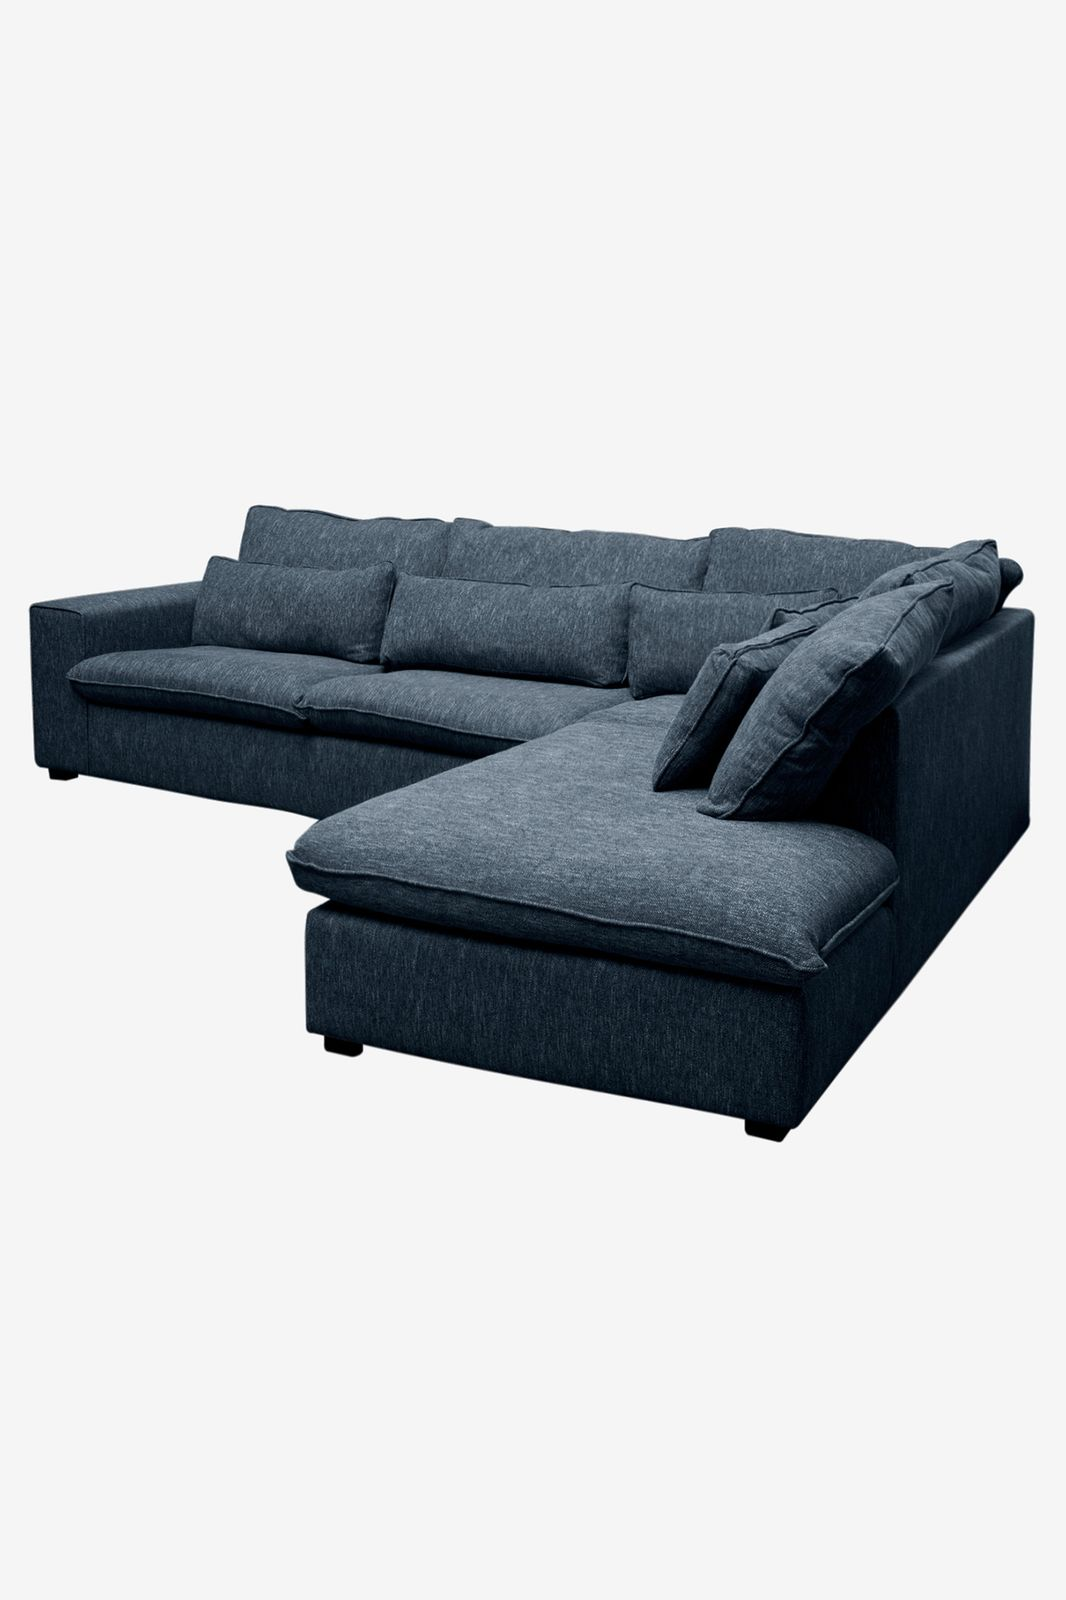 Baron bank 3.5-zits lounge rechts donkerblauw melee - Homeland | Sissy-Boy